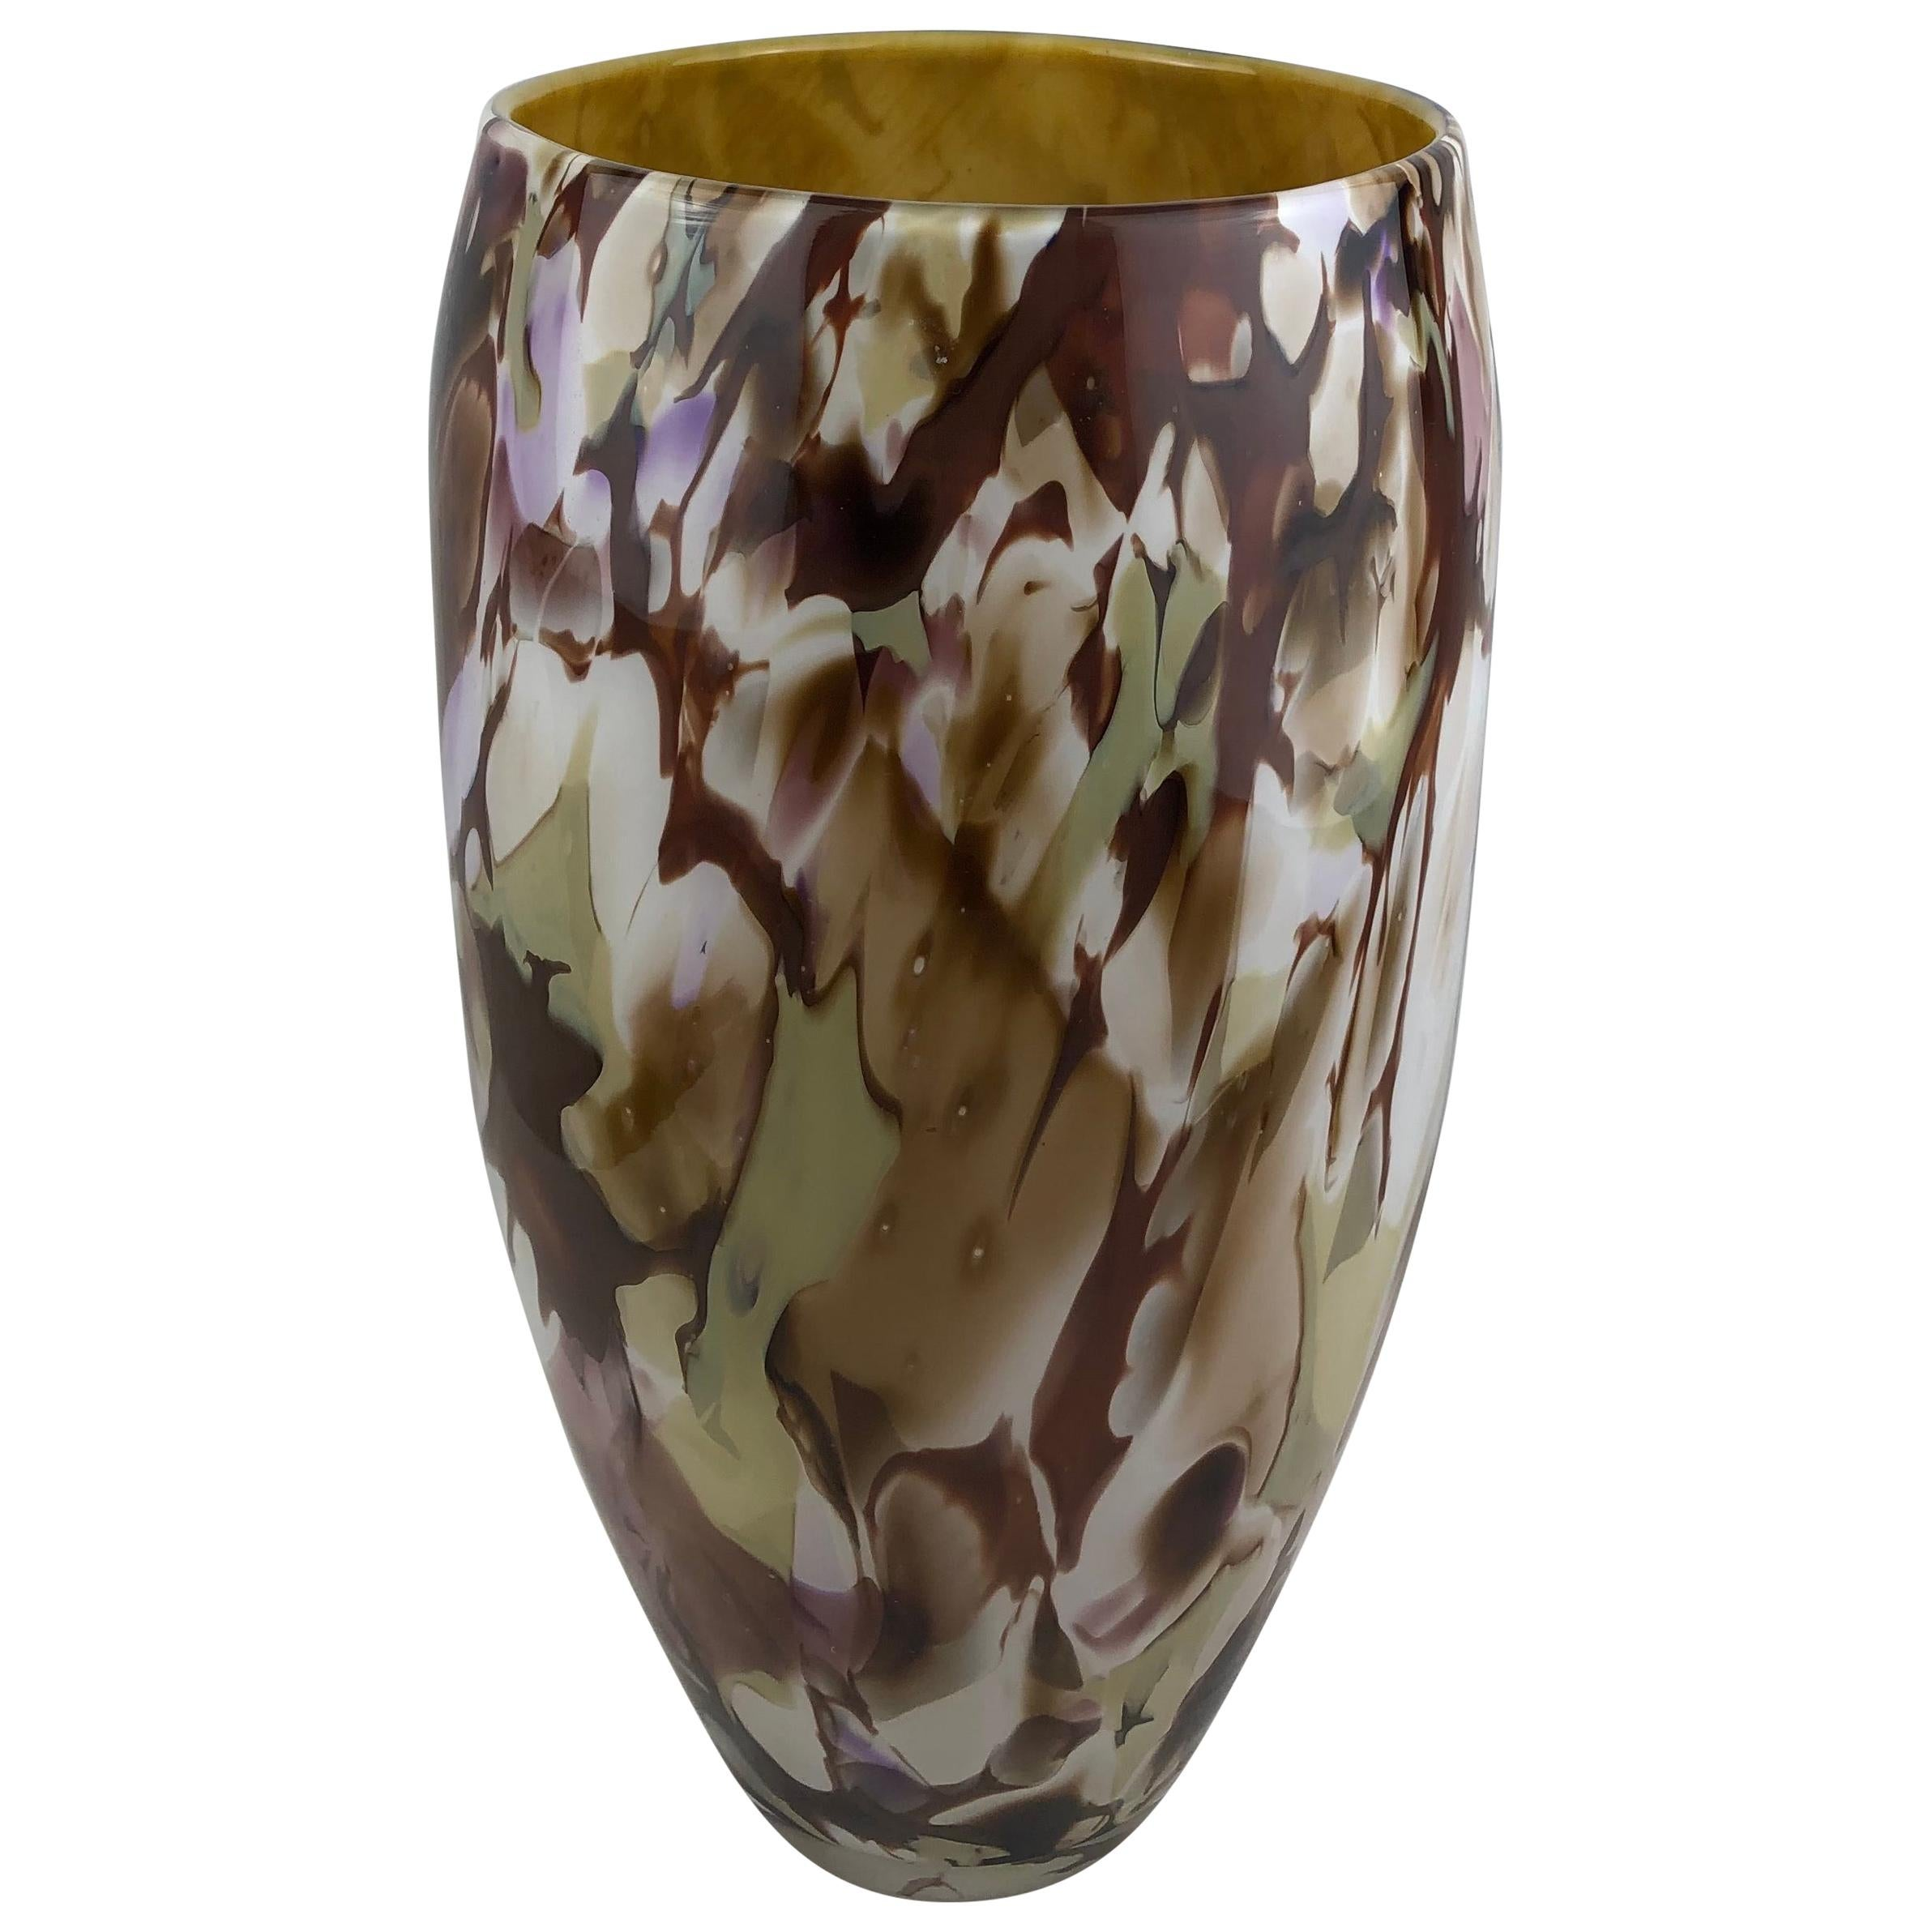 Large Stunning Multi-Colored Hand Blown Murano Art Glass Vase